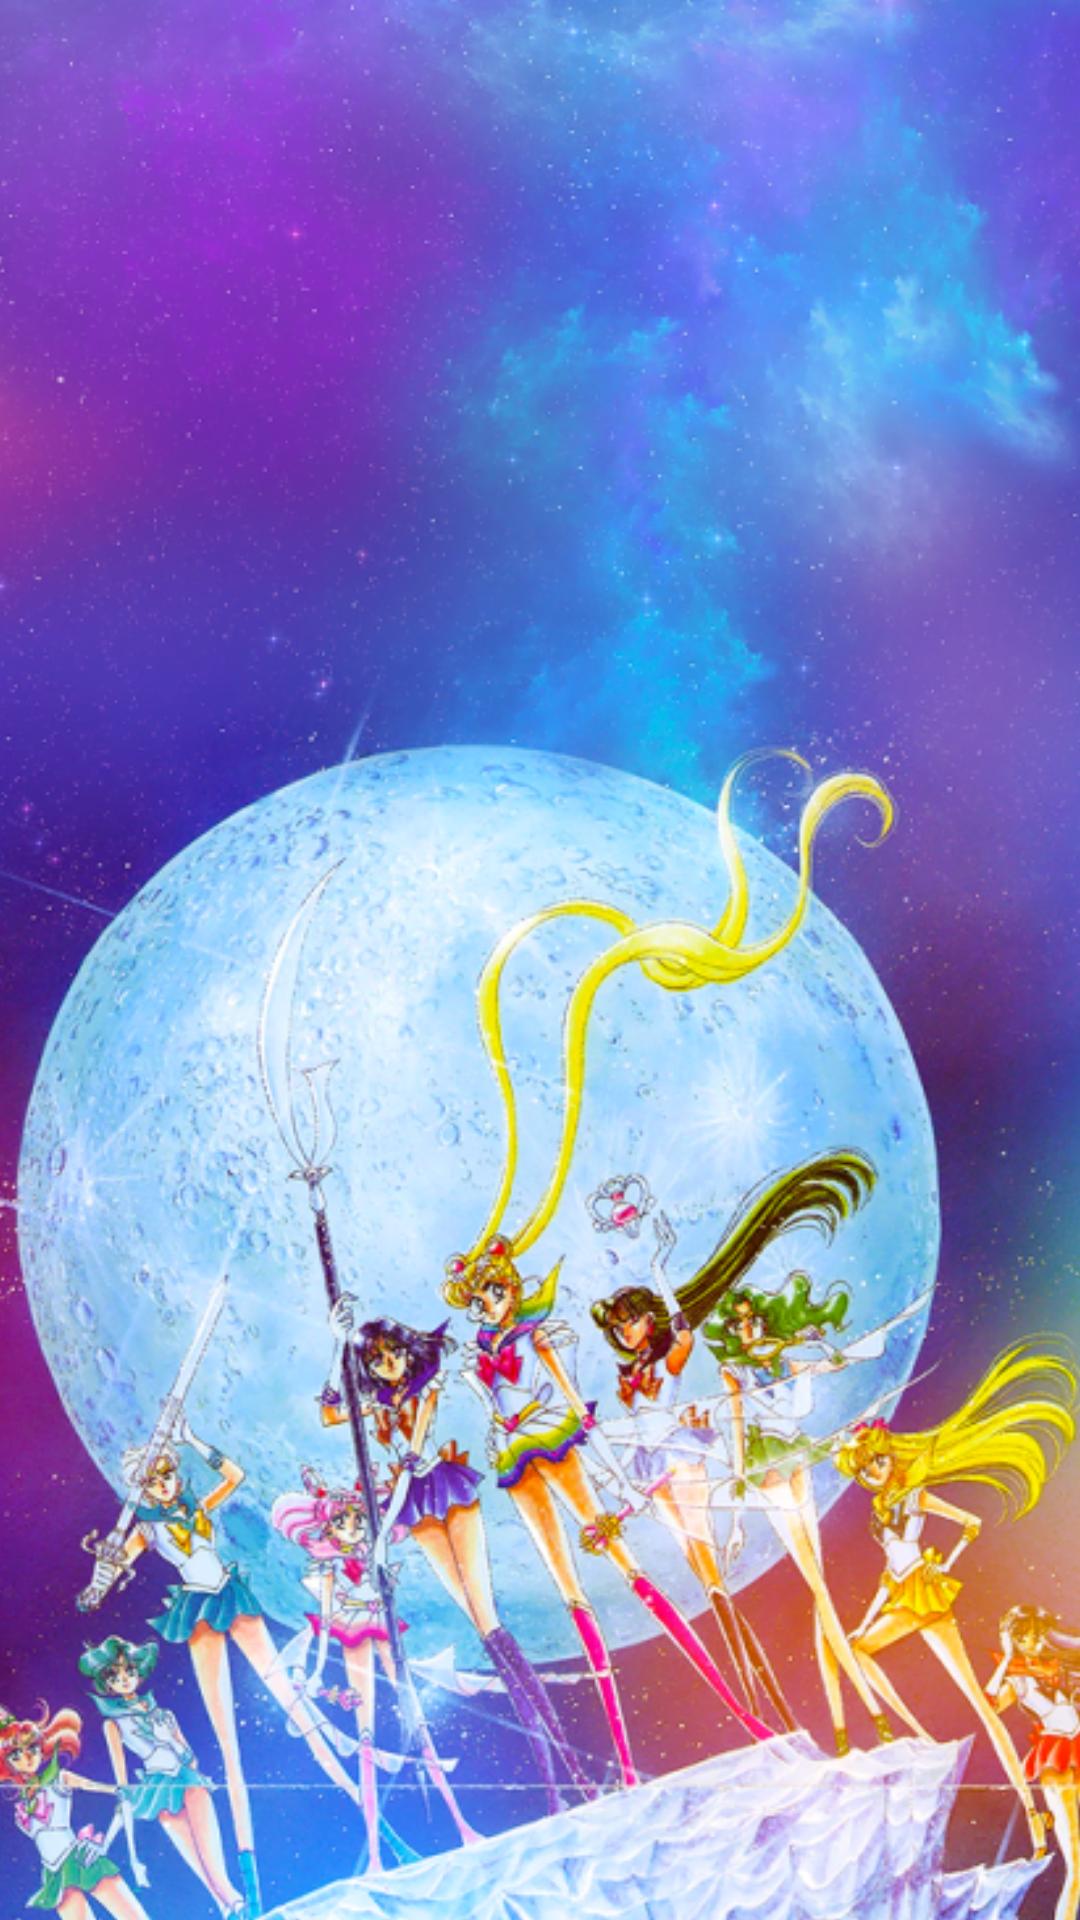 Kawaii Sailor Moon Iphone Wallpaper Ipcwallpapers Sailor Moon Wallpaper Sailor Moon Art Sailor Moon Aesthetic